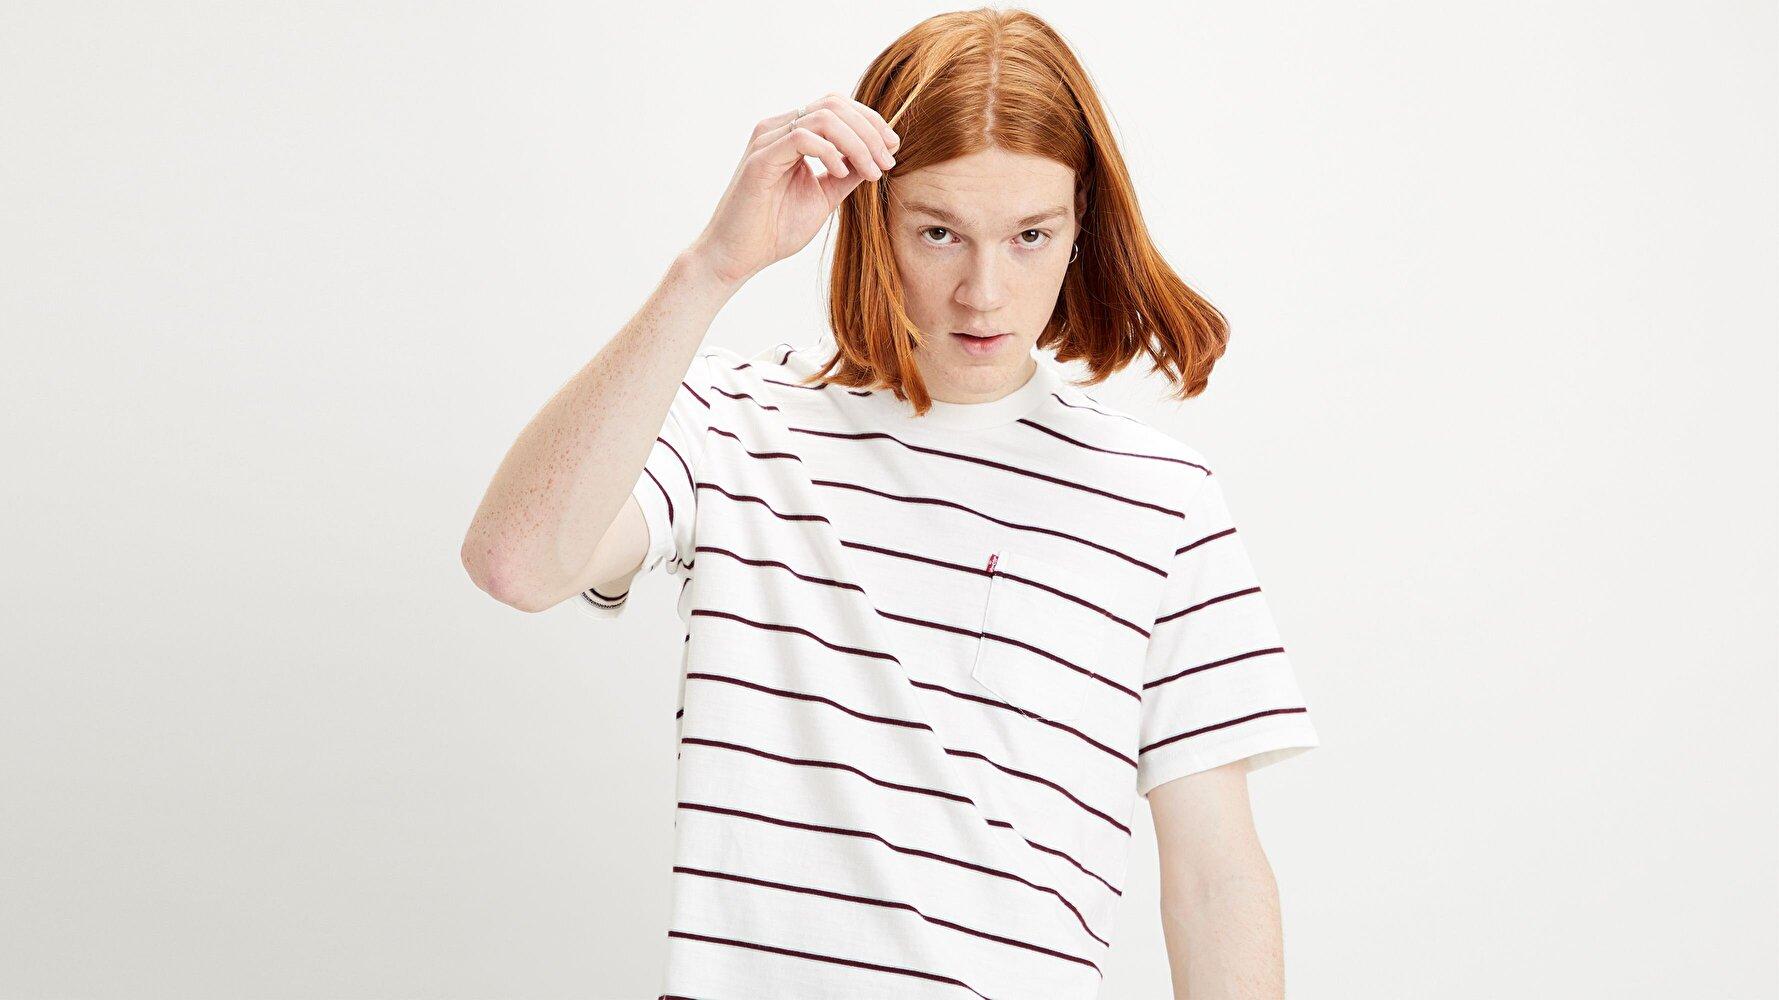 Ss Sunset Pocket Tee '20 Saturday Stripe Çok renkli Erkek Tişört